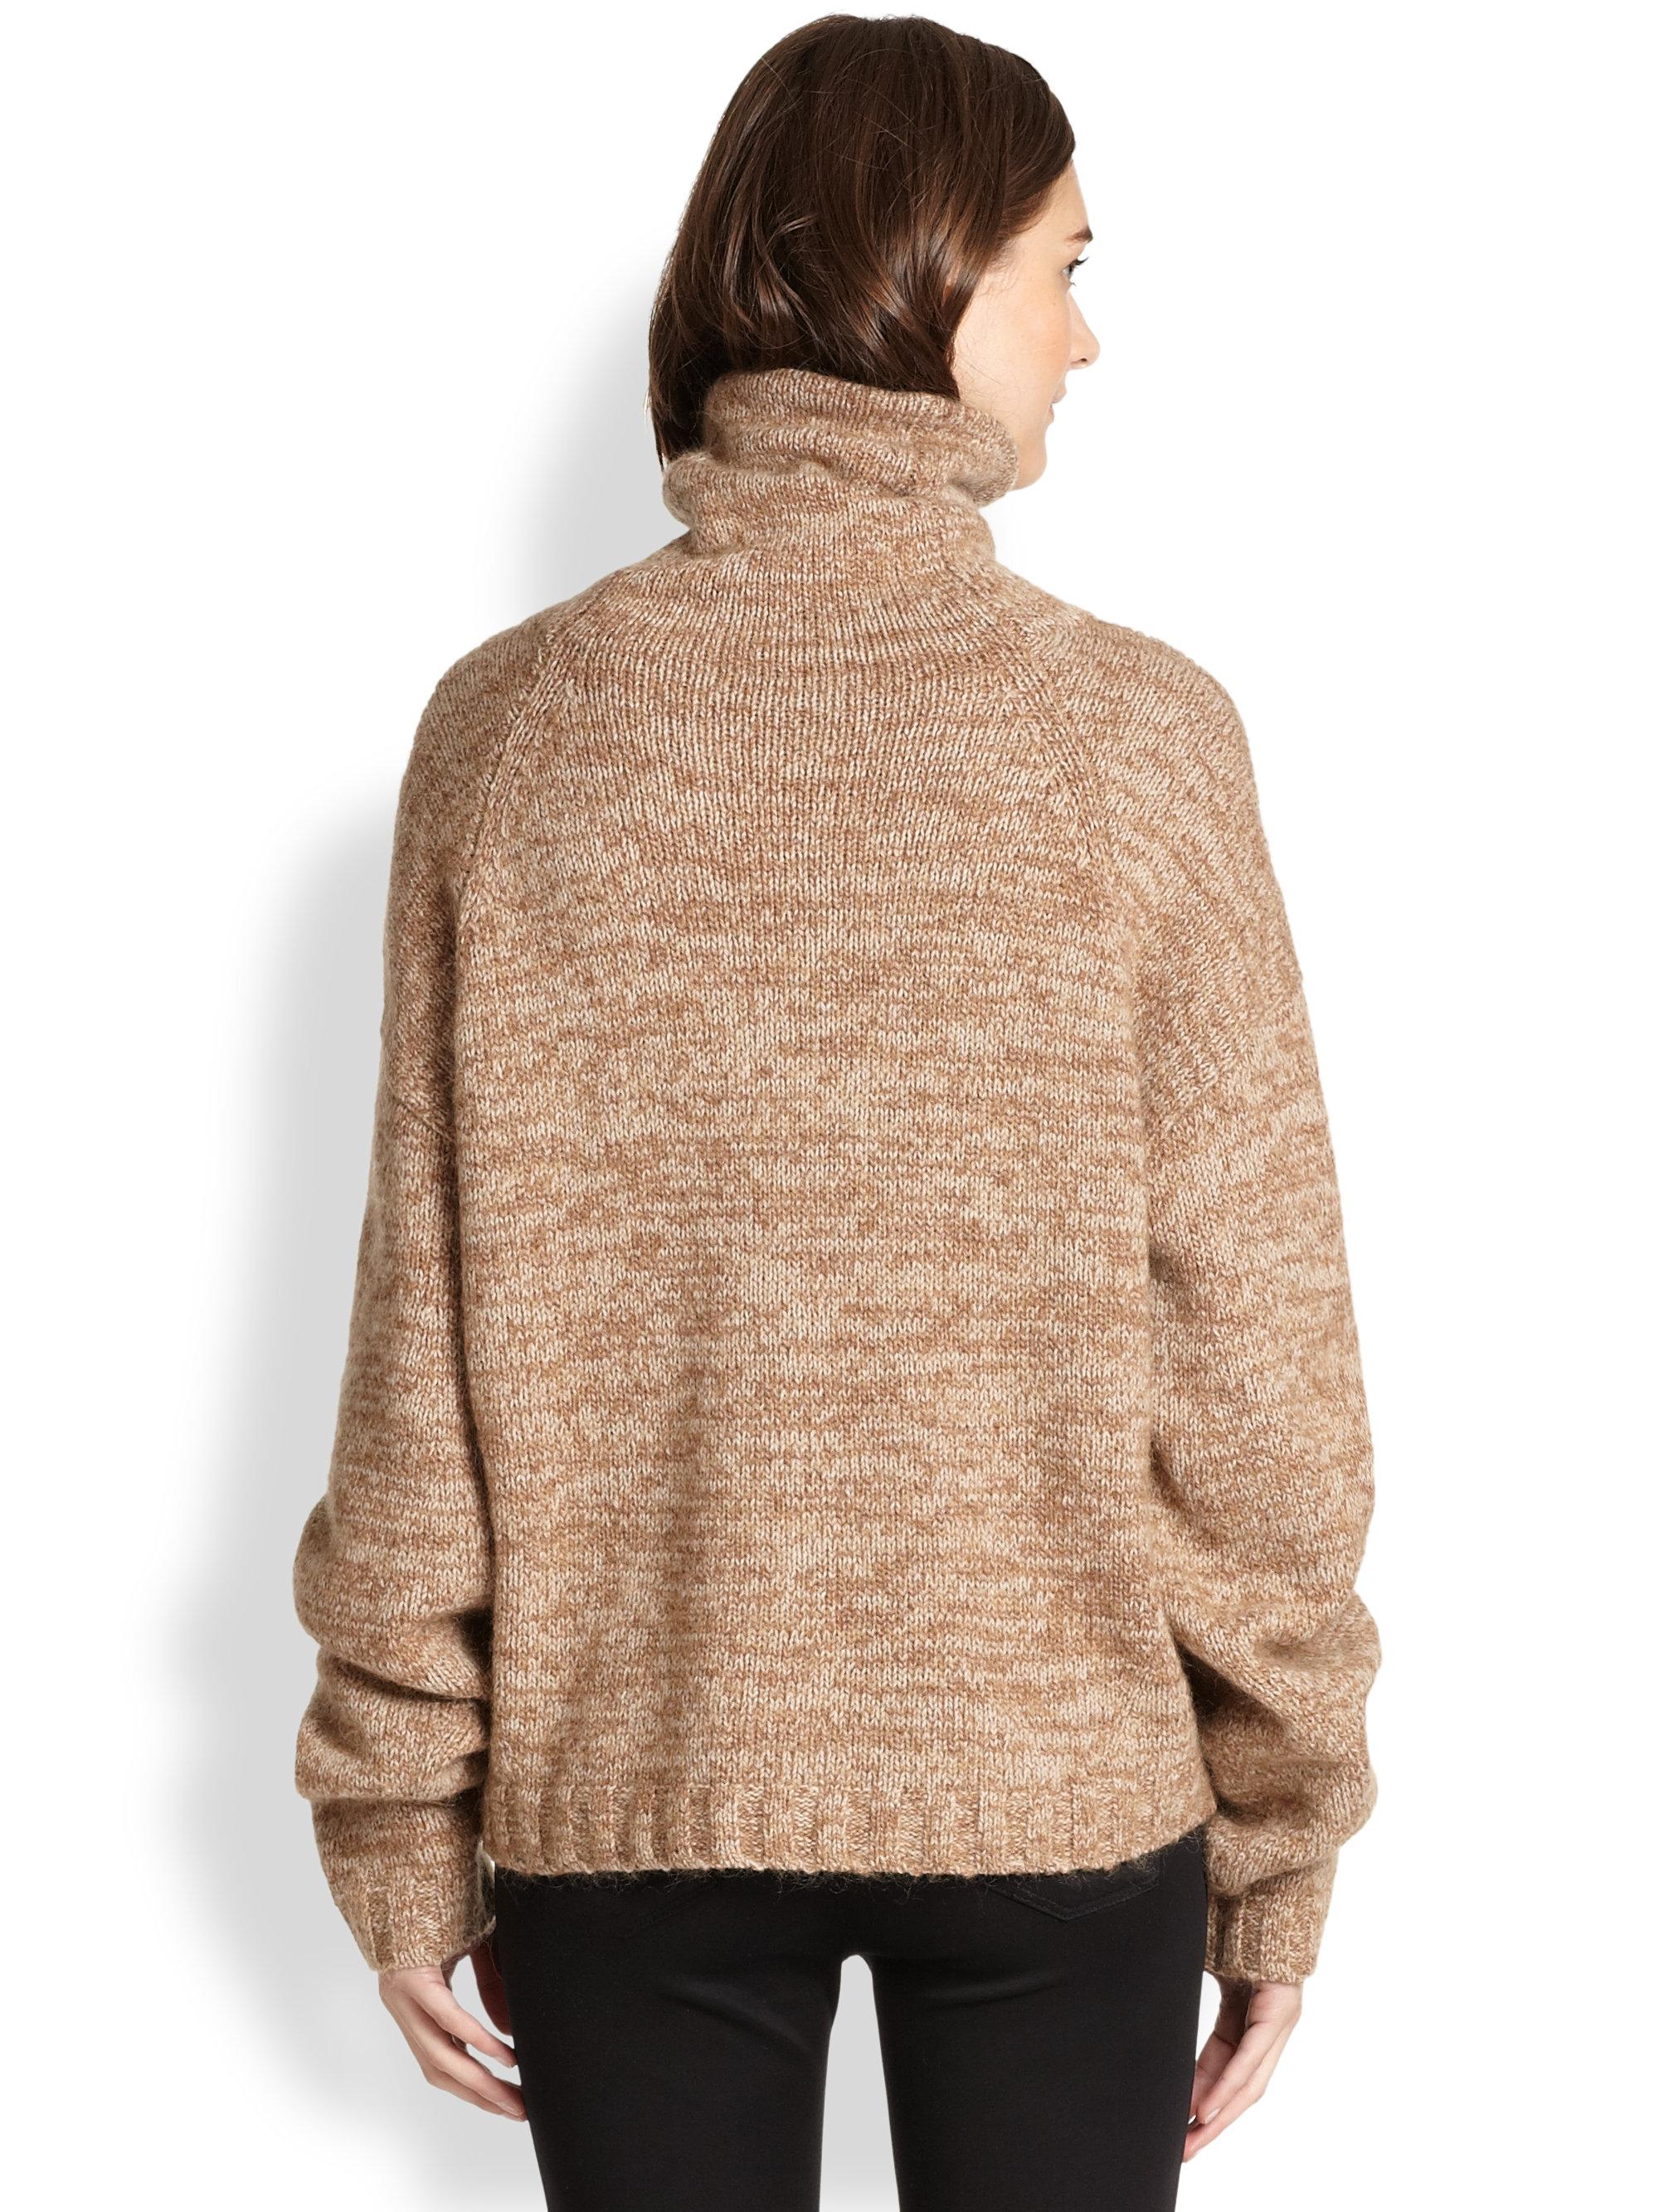 Lyst Acne Studios Dedicate Oversized Marled Wool